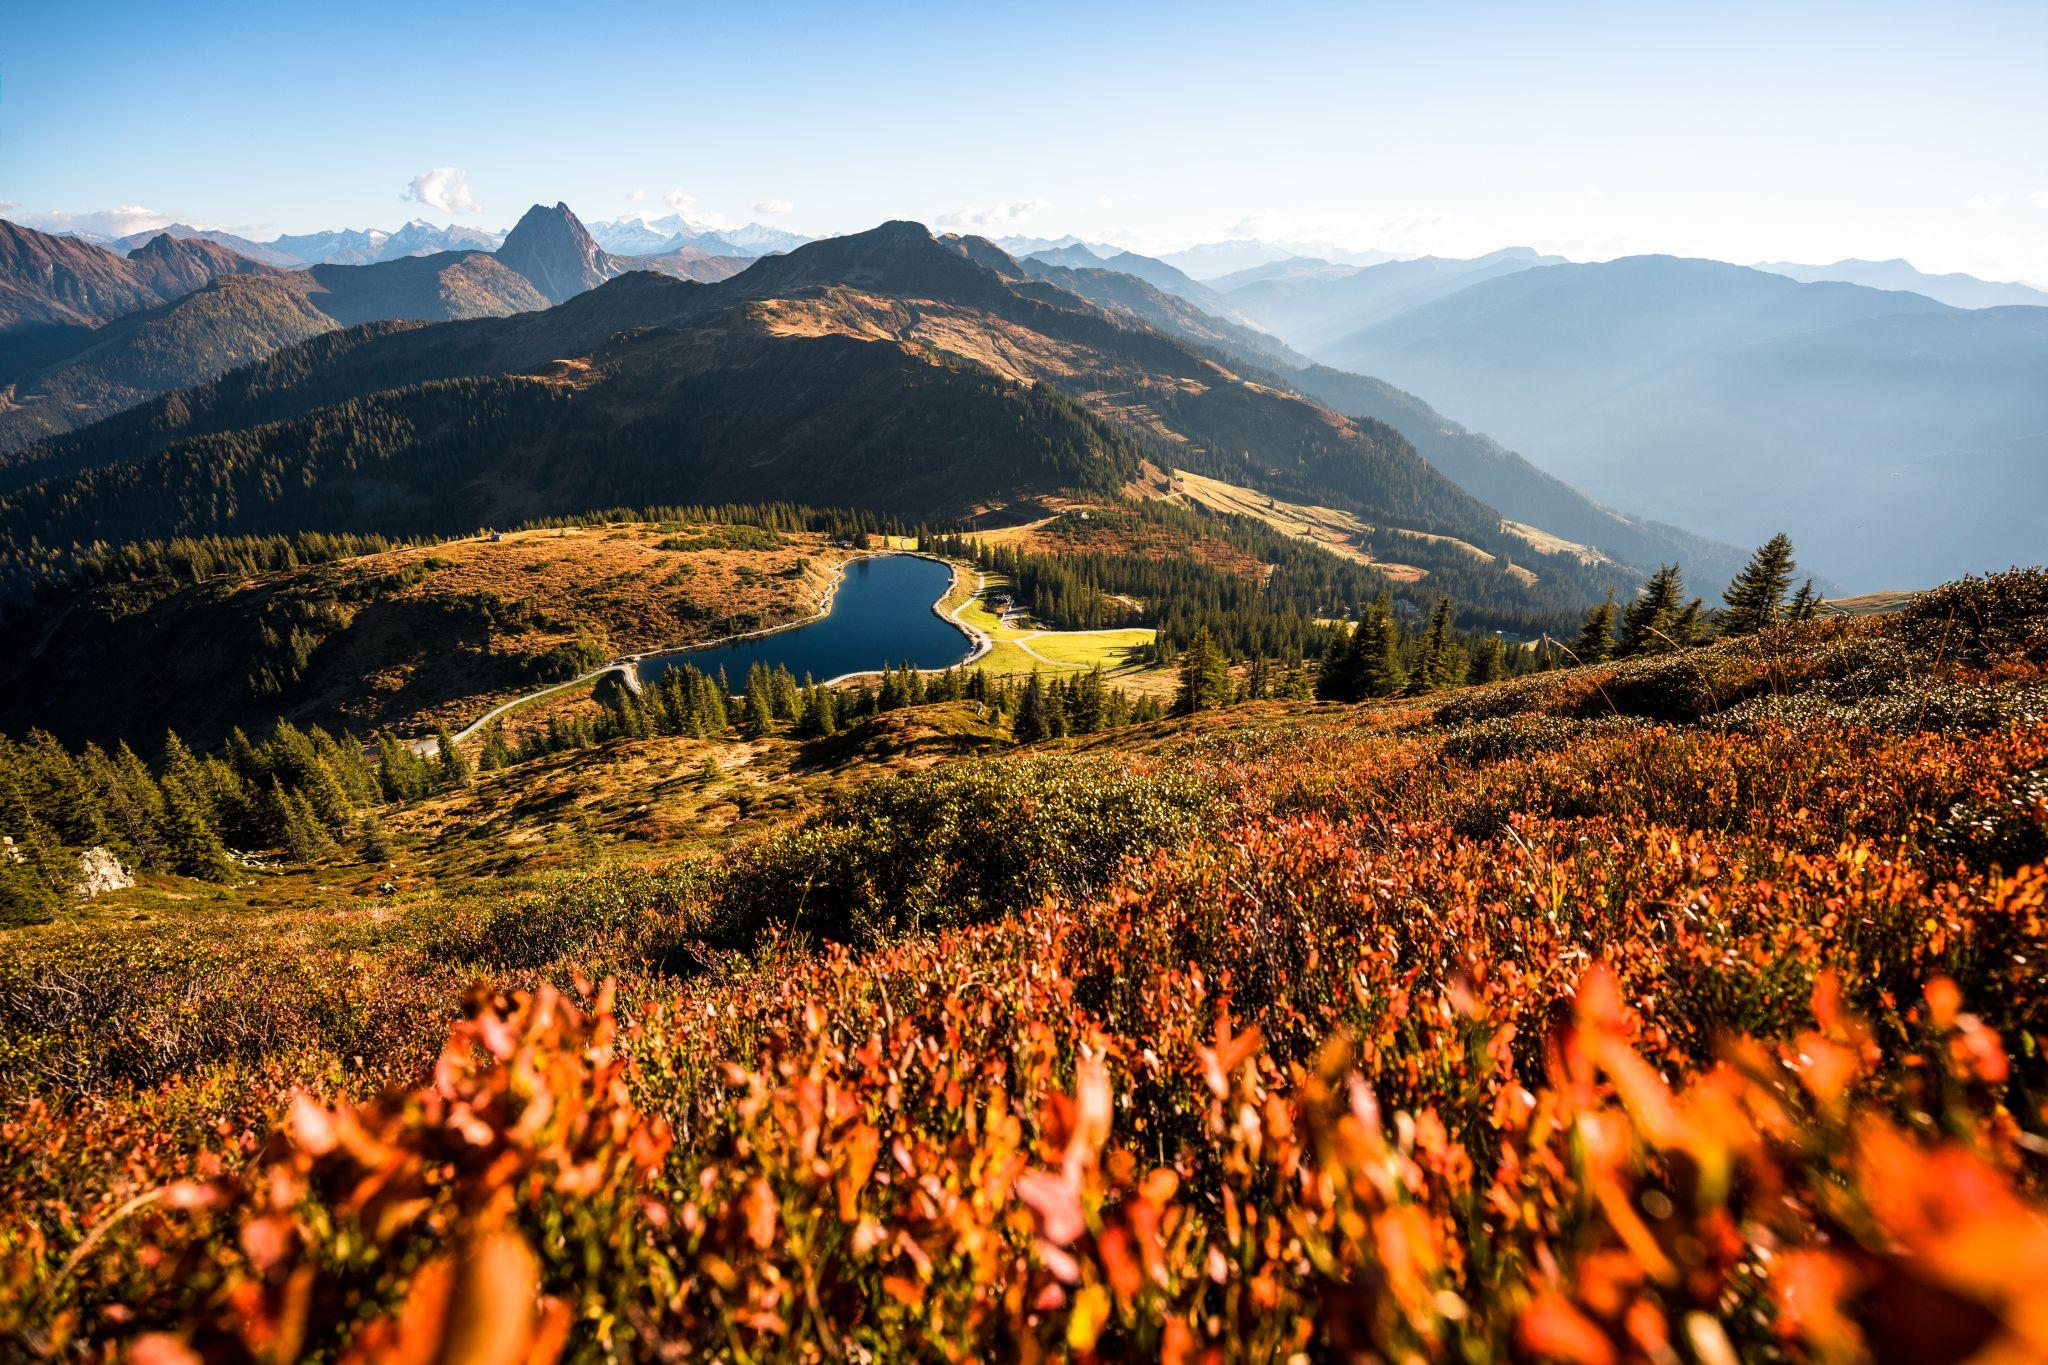 Herbst Kitzbüheler Alpen © Mathäus Gartner